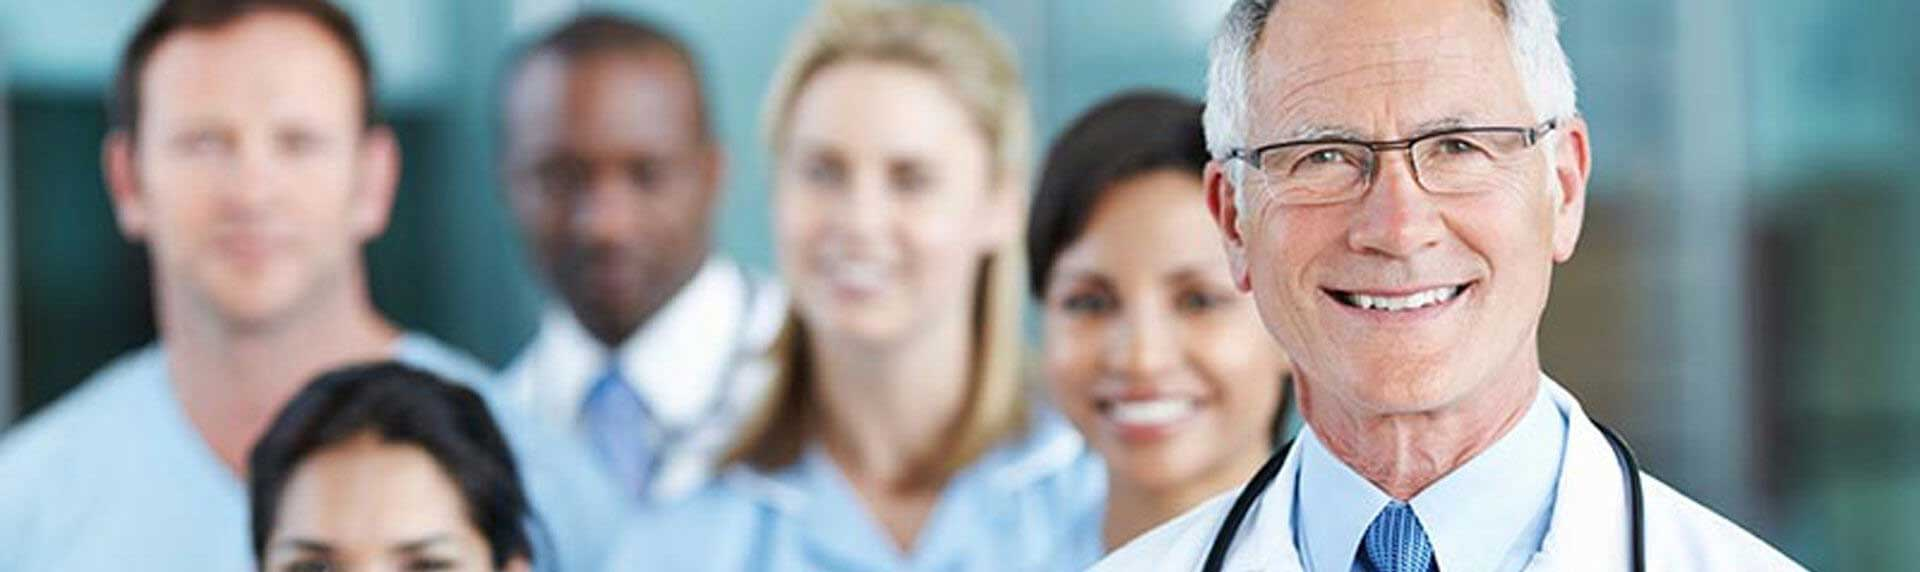 pediatric-doctor-sandringham